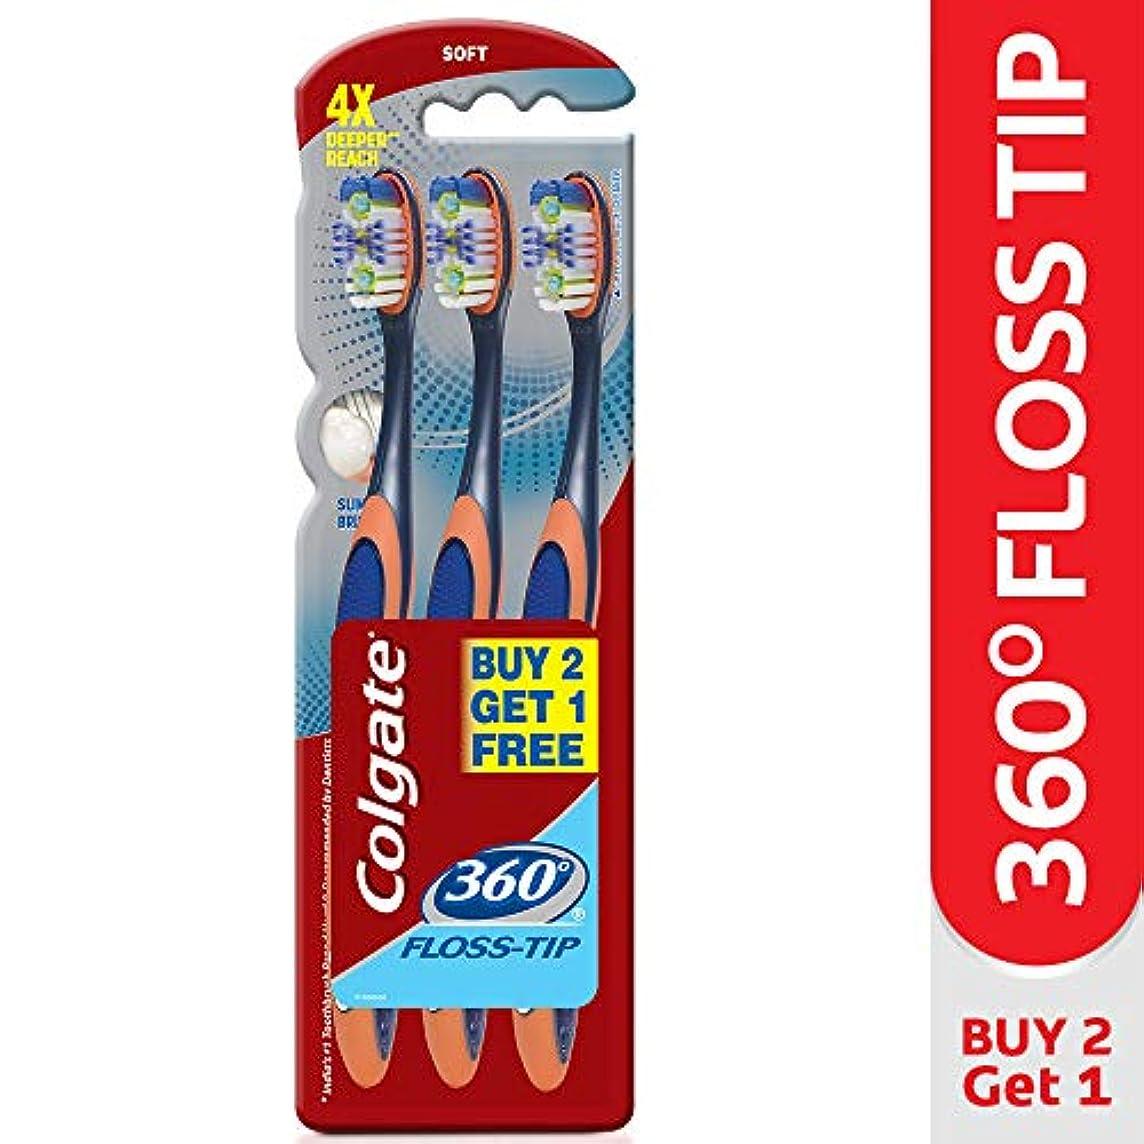 Colgate 360 FLOSS-TIP (MEDIUM) TOOTHBRUSH (3PC PACK)